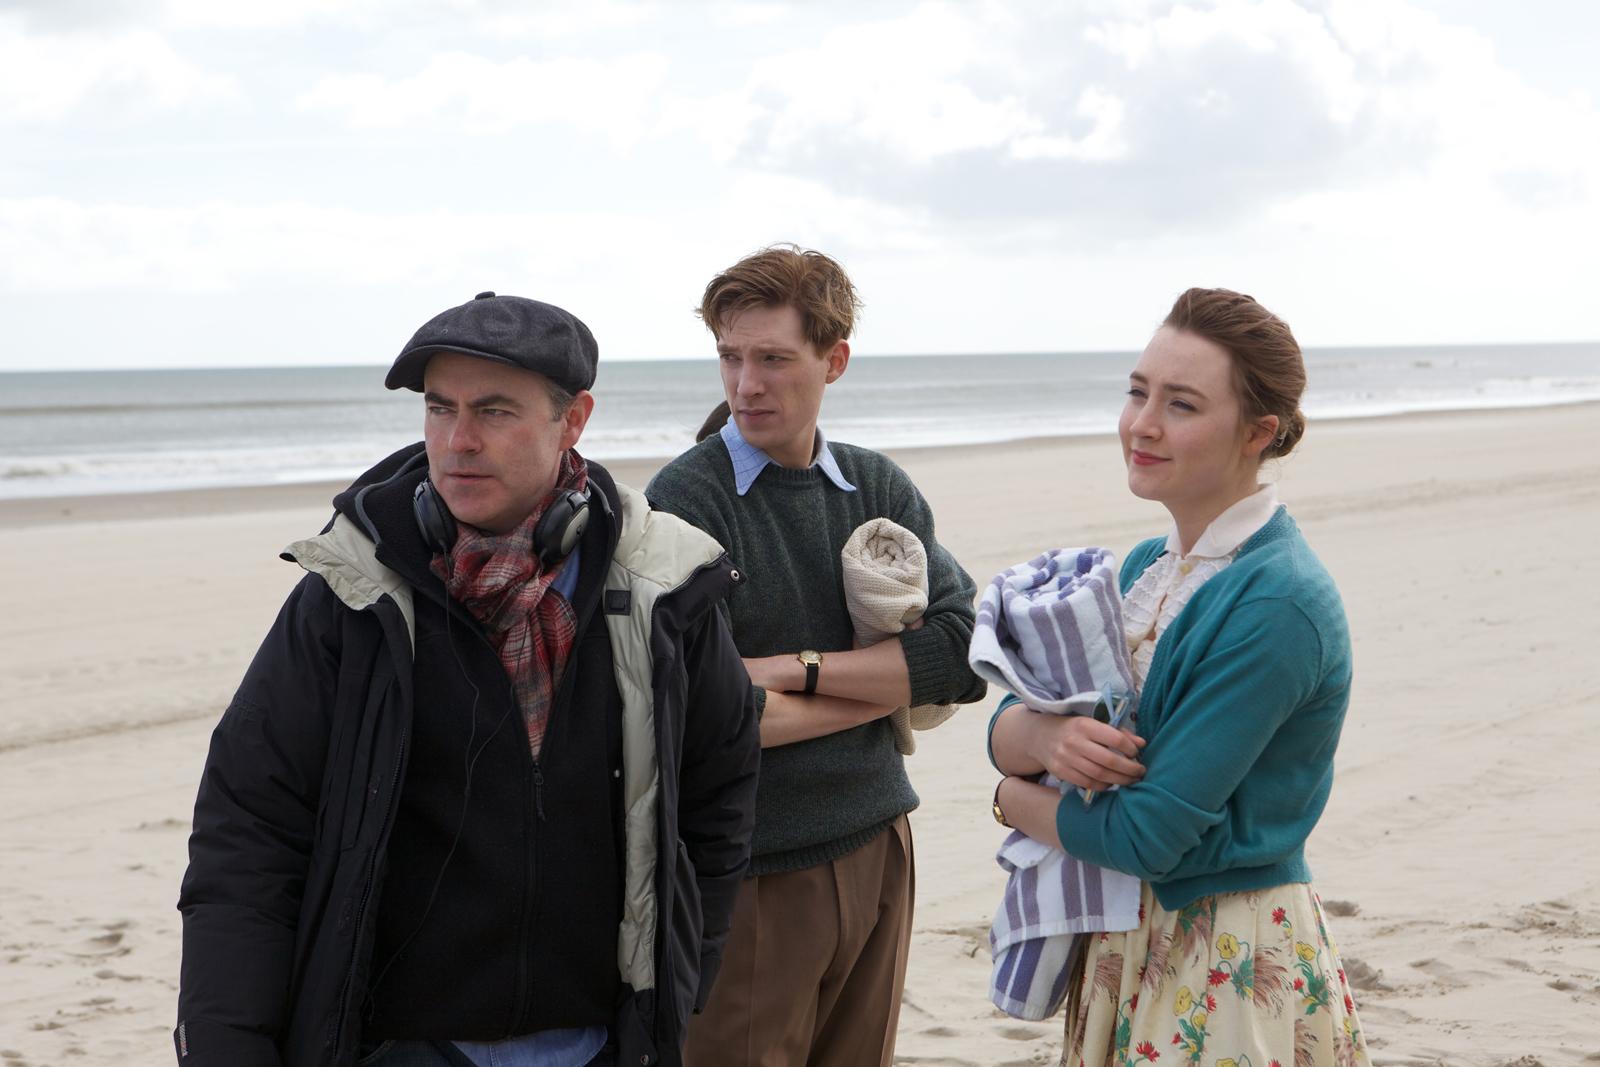 Director John Crowley, Domhnall Gleeson, and Saoirse Ronan on th